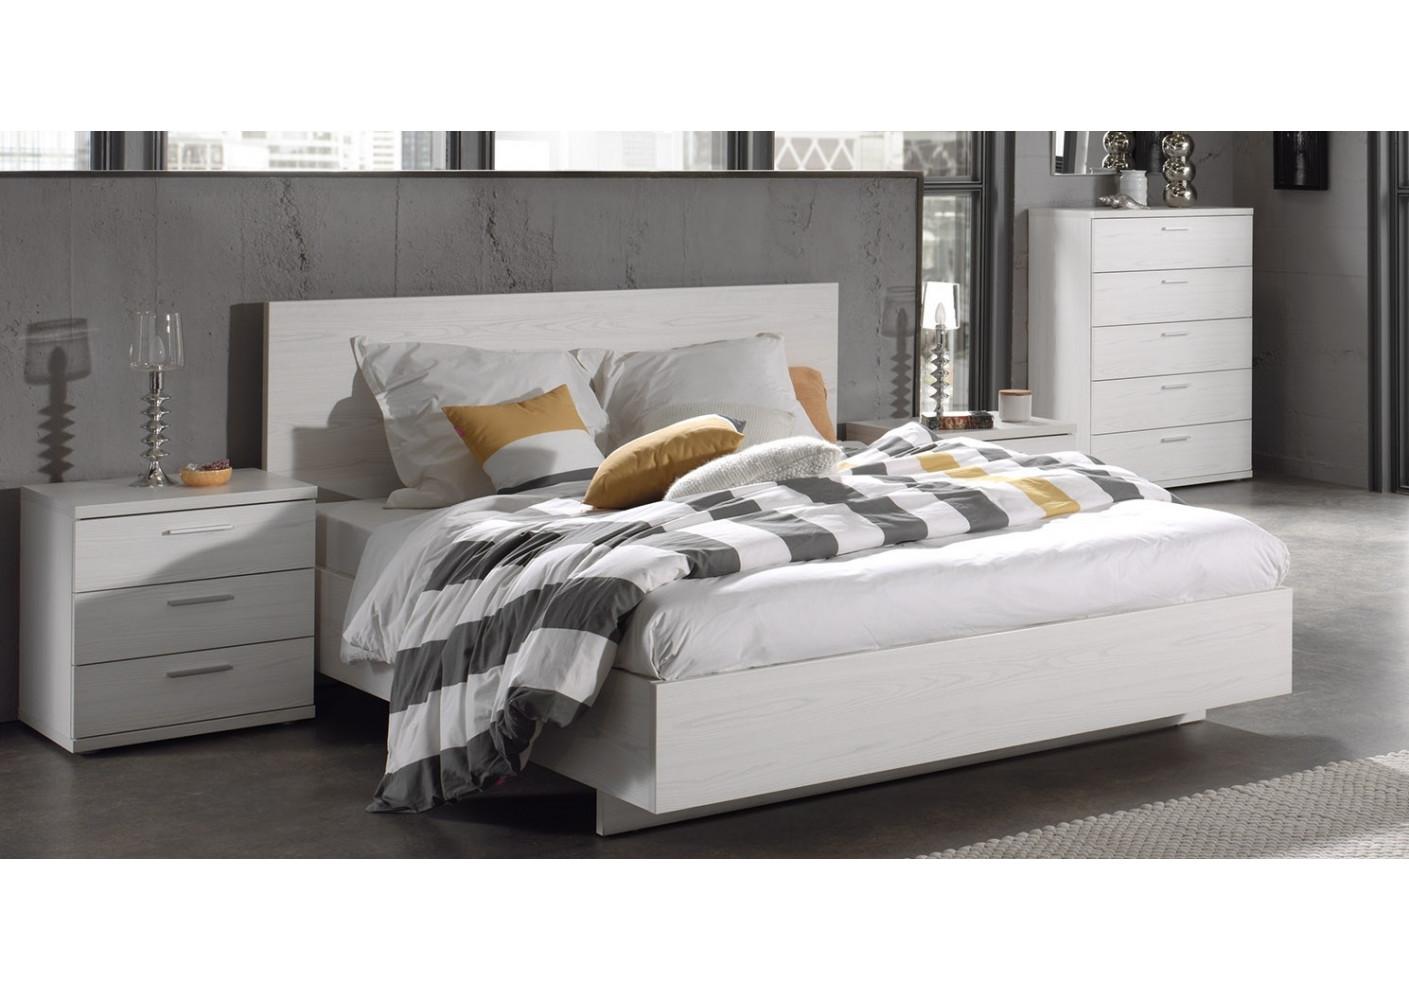 lit 140x190 gael ch ne moonlight lits 2 places chambre. Black Bedroom Furniture Sets. Home Design Ideas